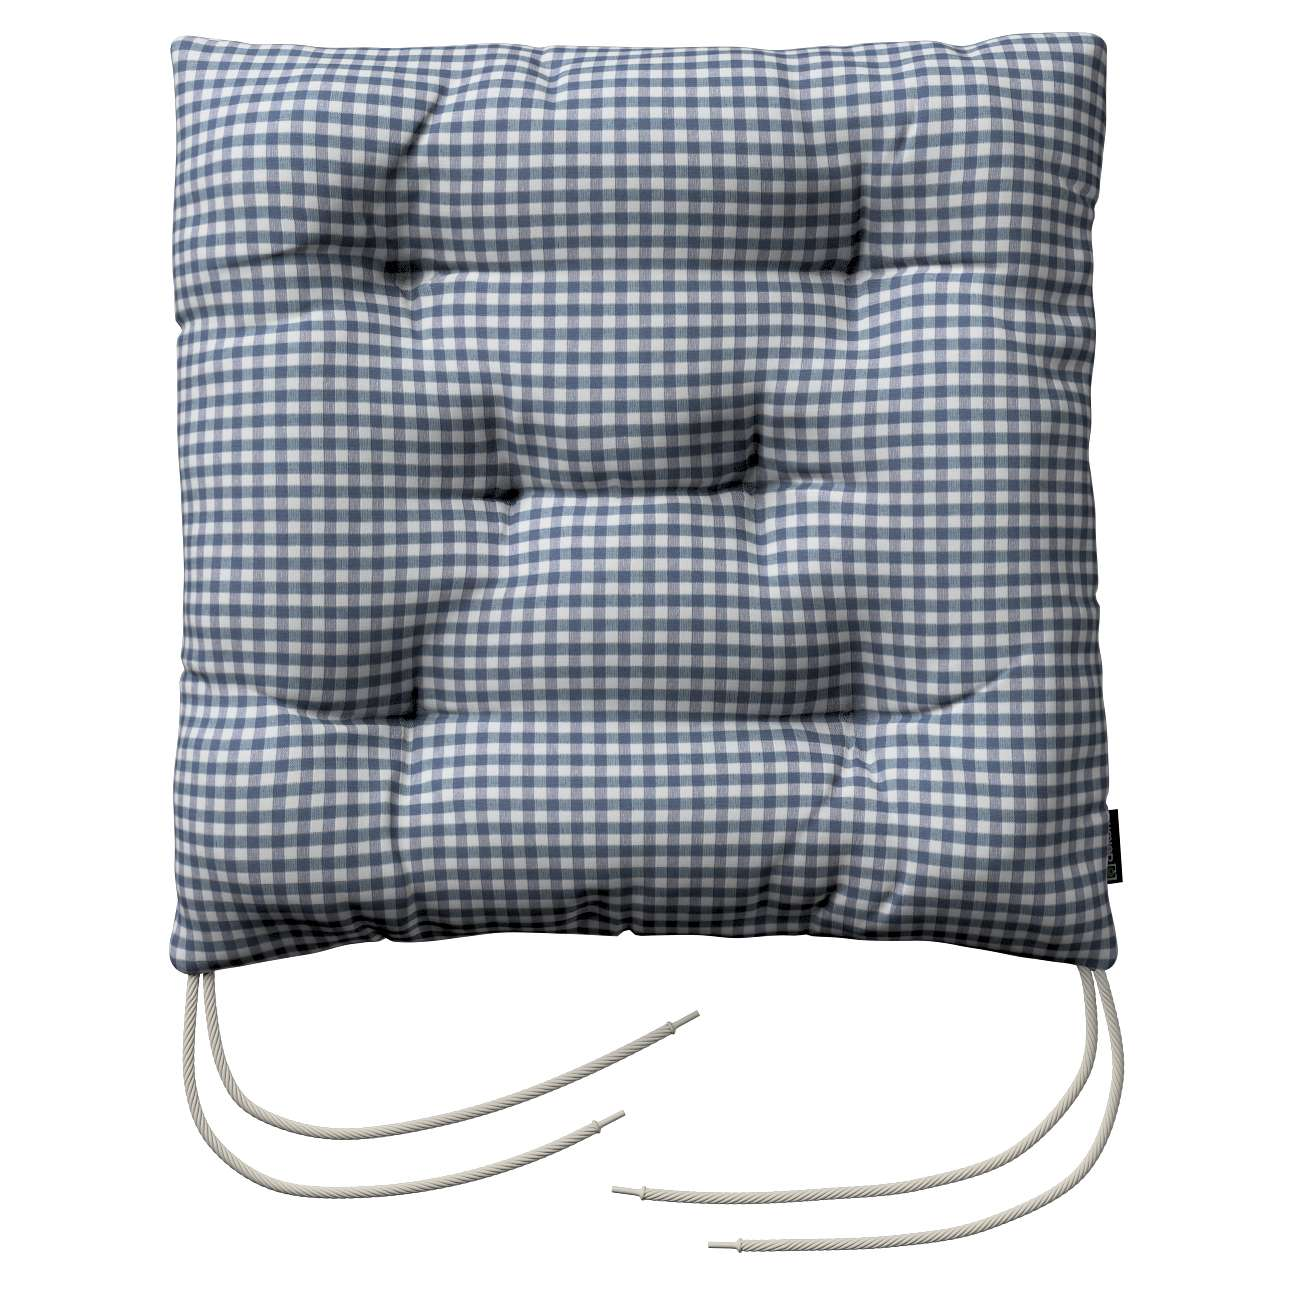 Quadro 136-00 V kolekcii Quadro, tkanina: 136-00